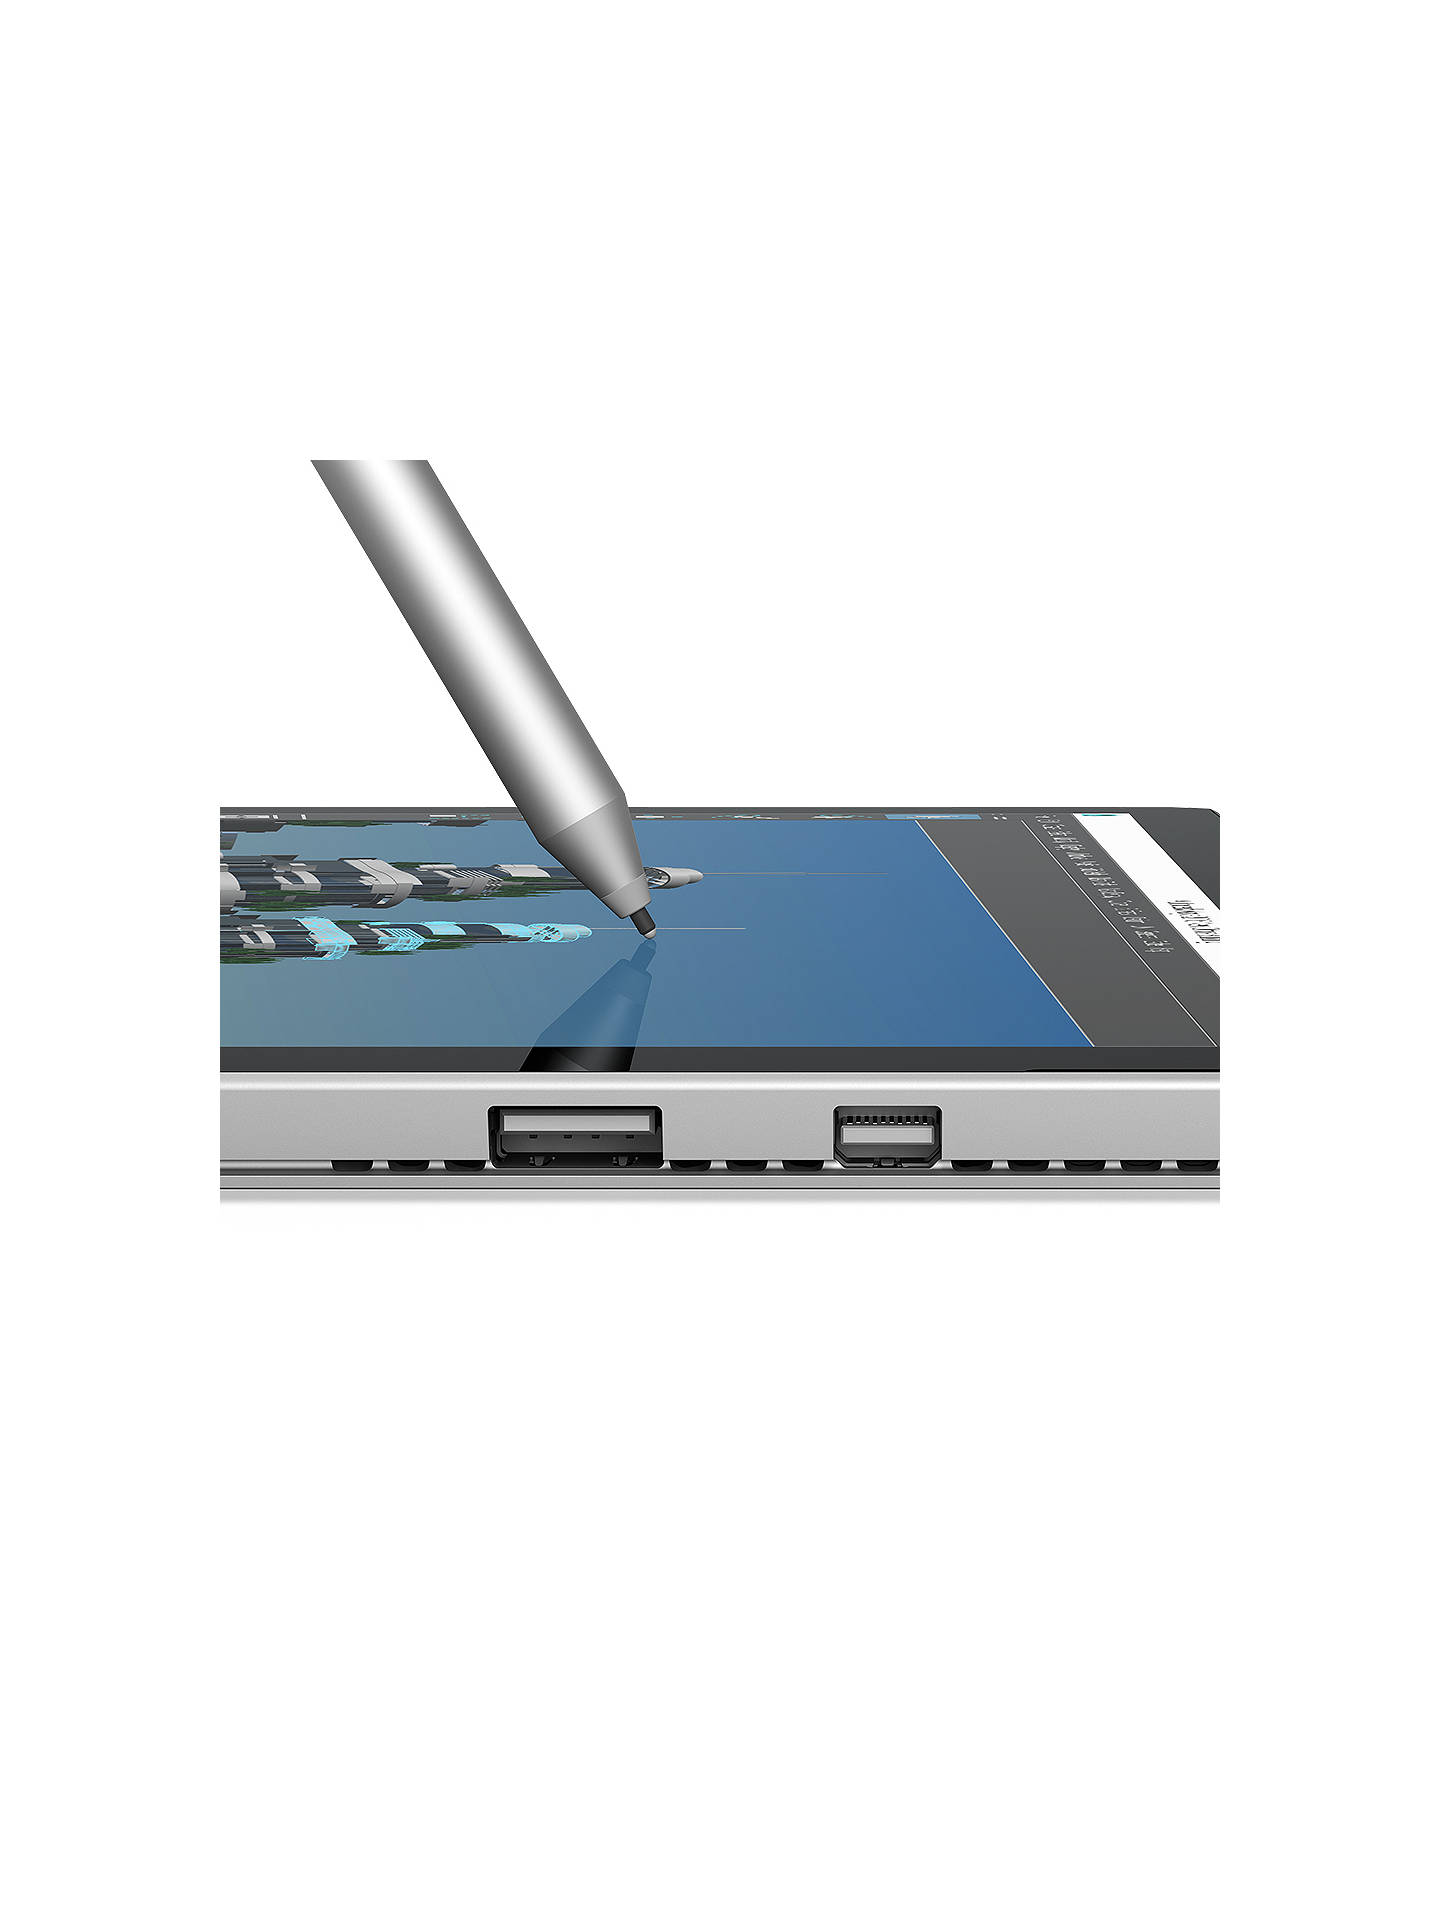 microsoft surface pro 4 tablet intel core i7 16gb ram. Black Bedroom Furniture Sets. Home Design Ideas